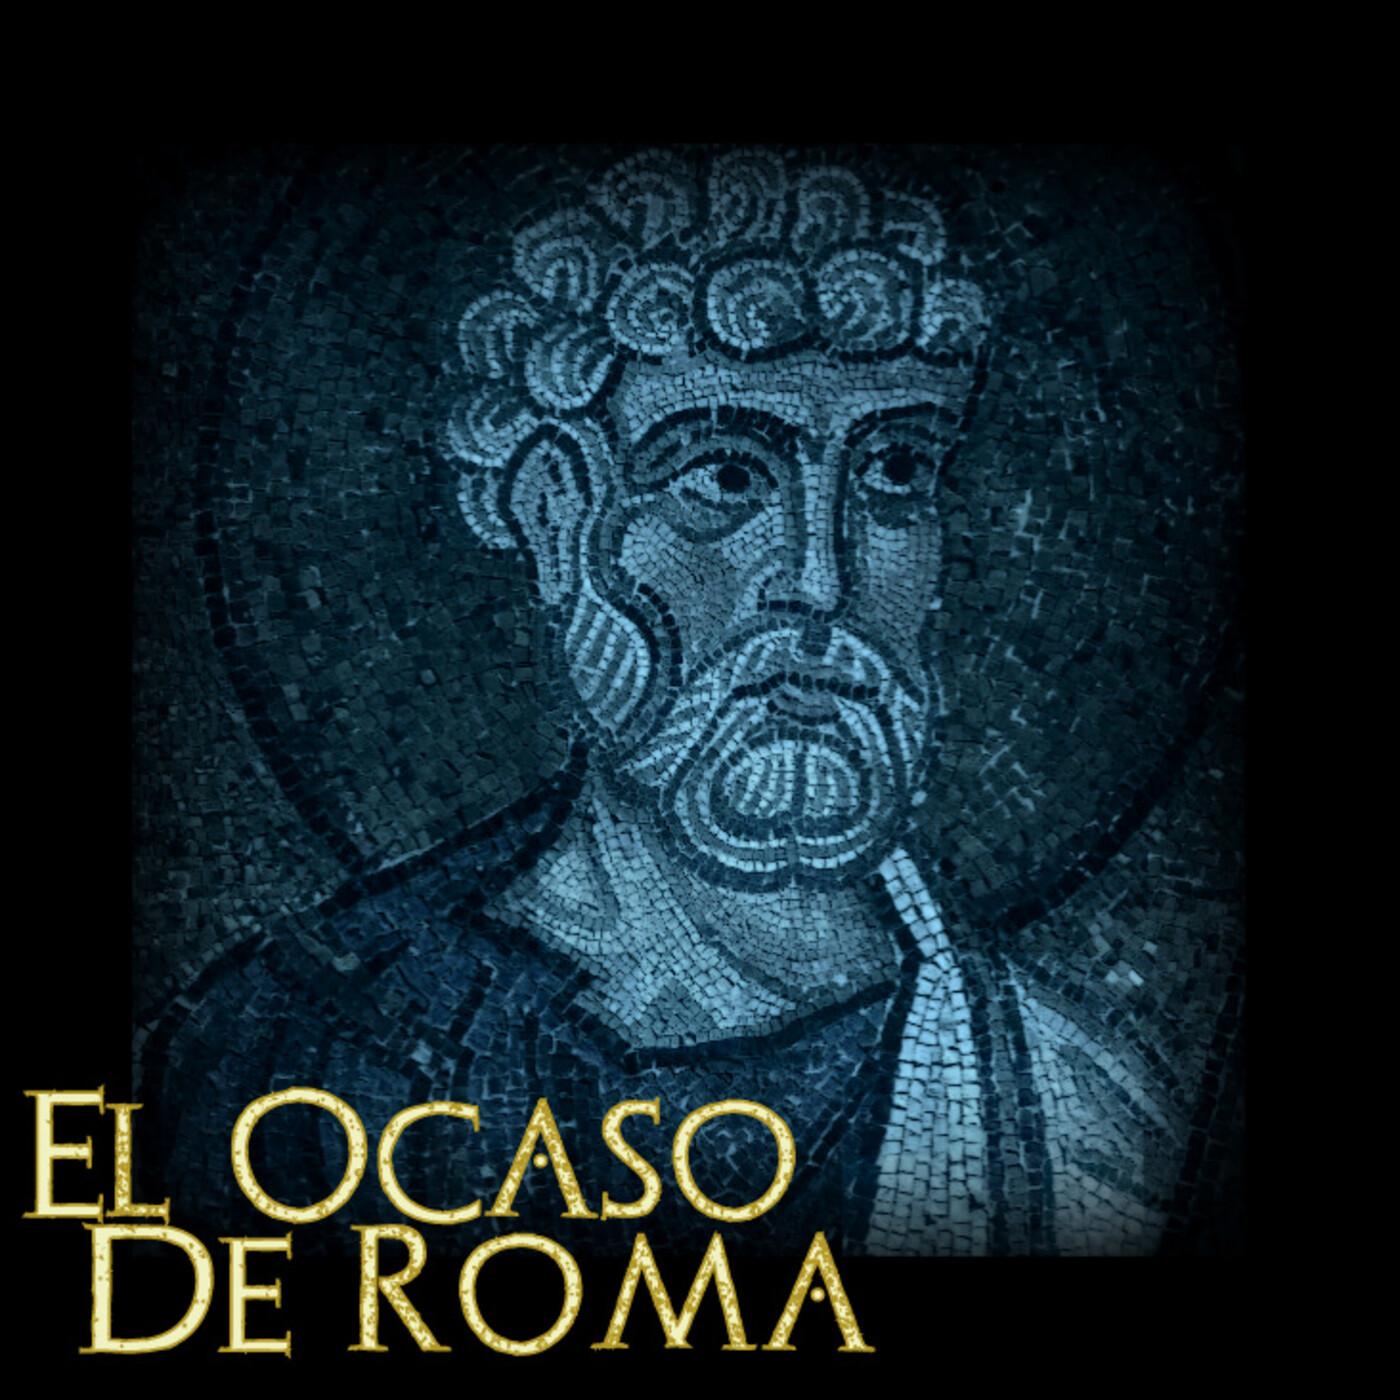 Cristianismo e Iglesia hasta el siglo IV: Problemas externos (prejuicios y traumas) + Organización interna. Episodio 50 - Acceso anticipado